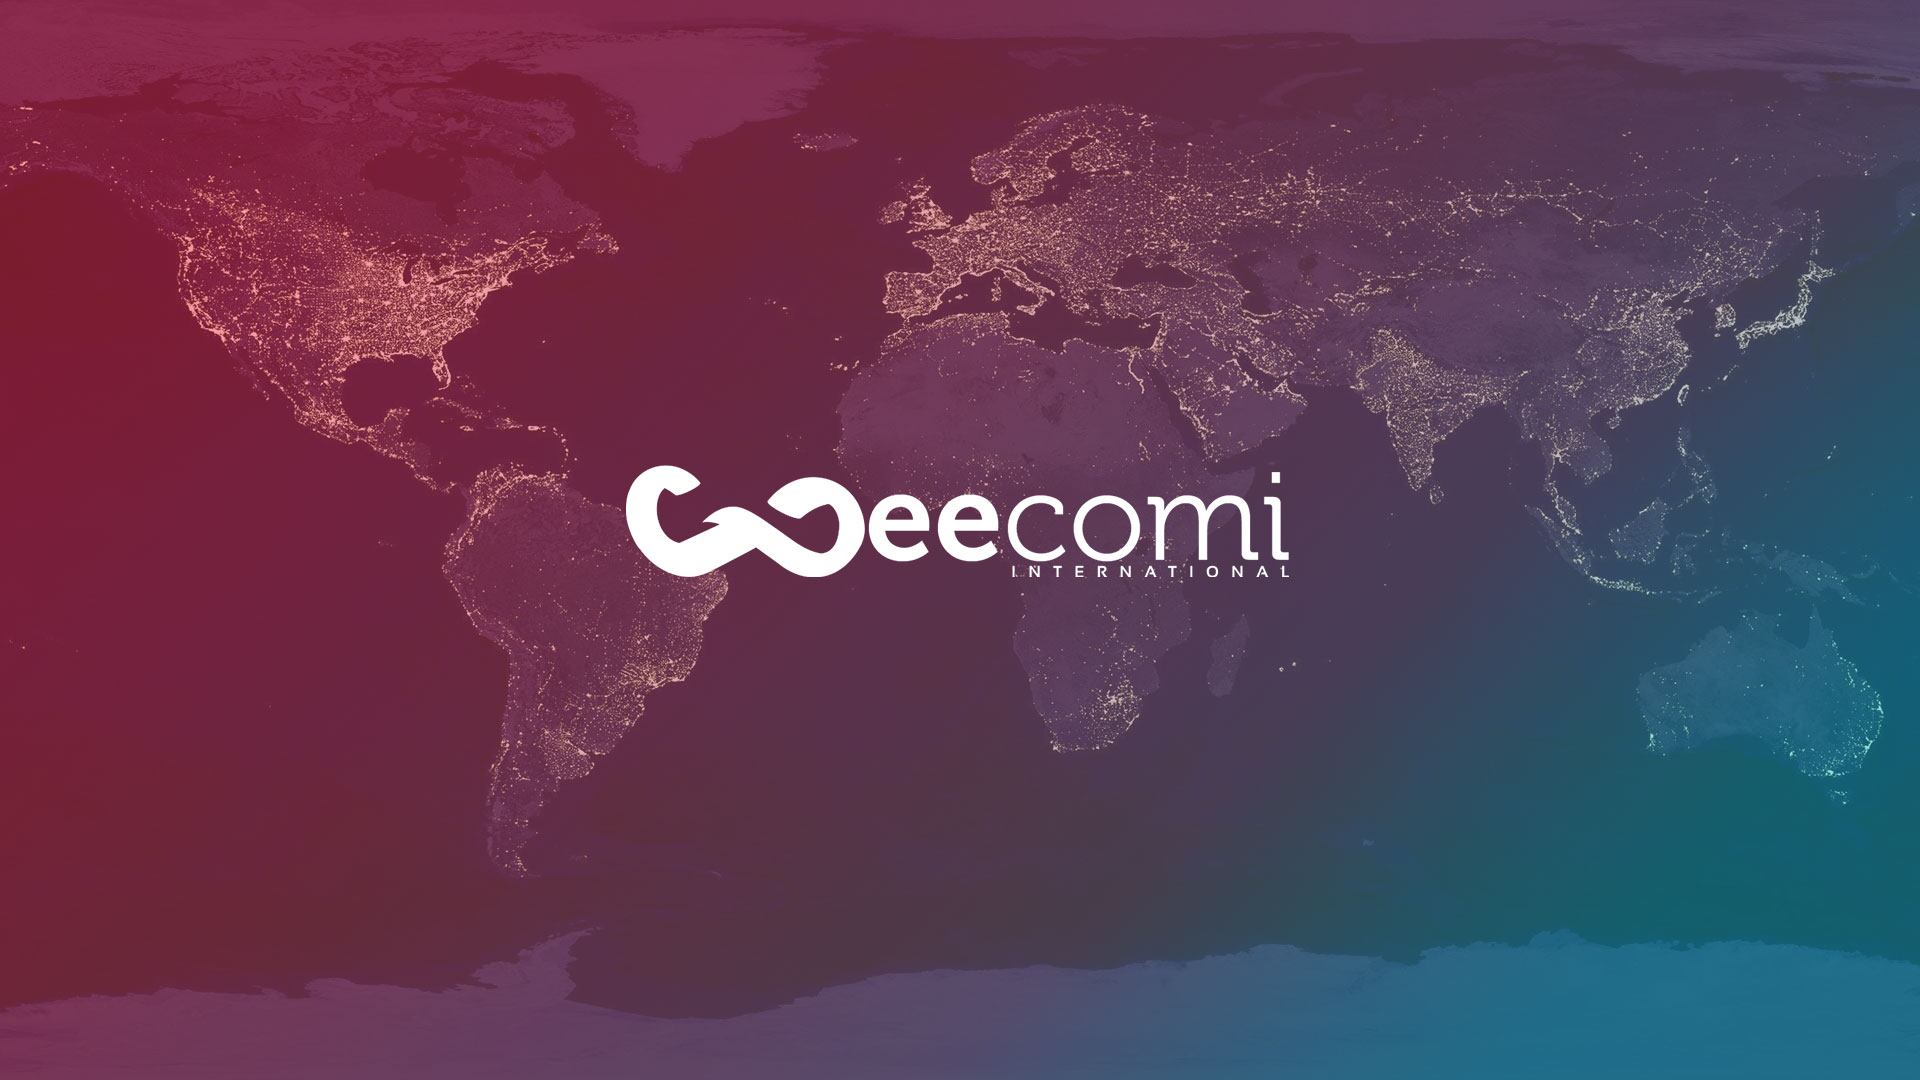 Weecomi International